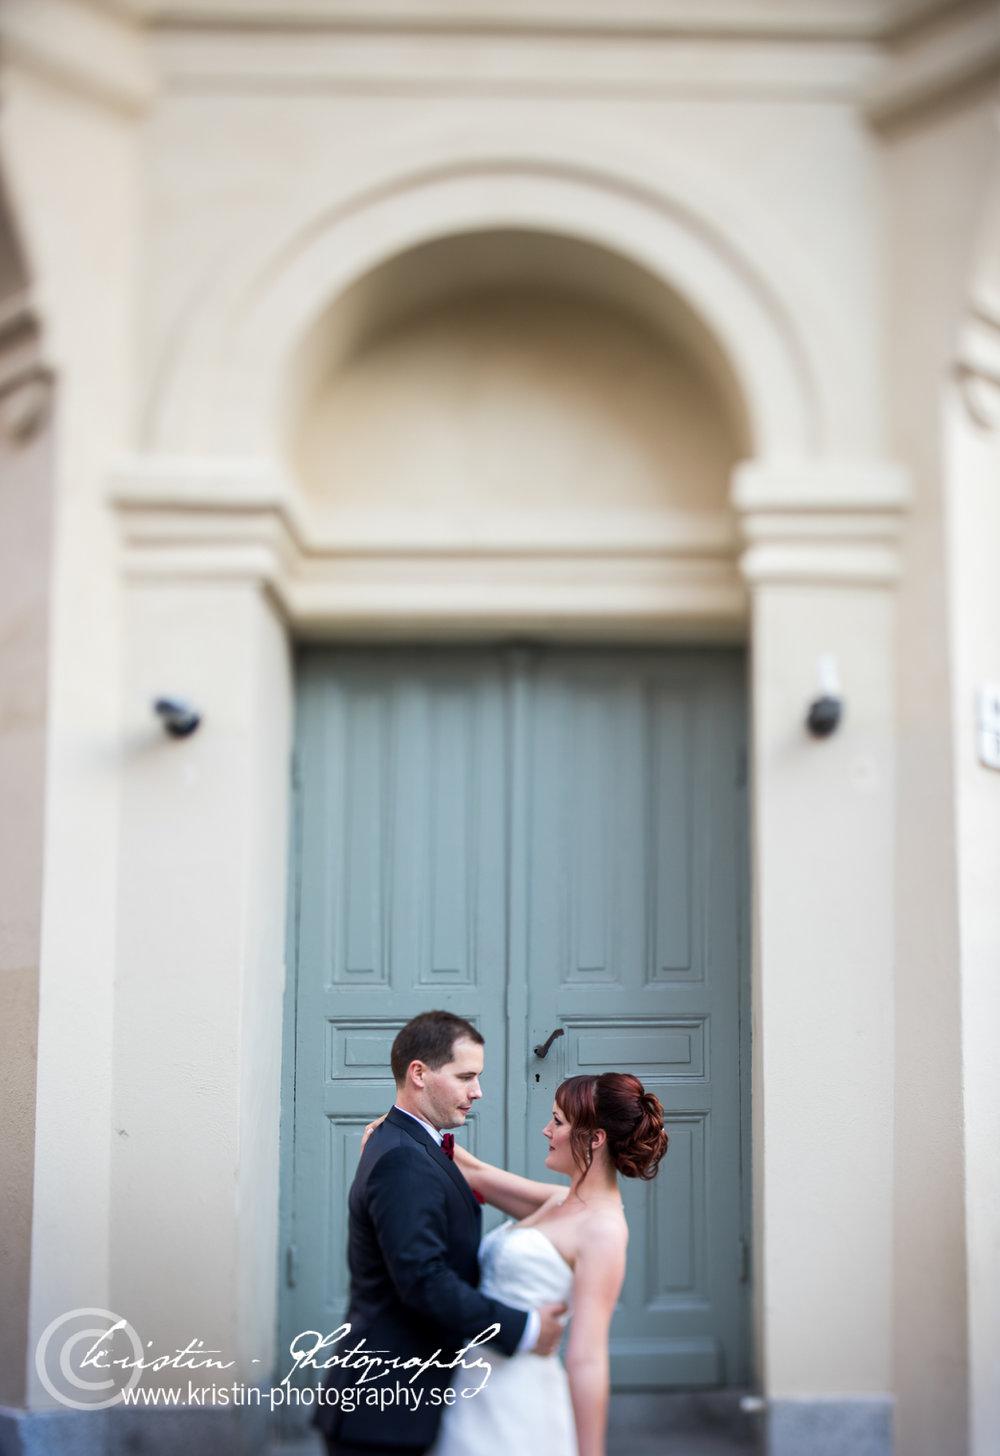 Bröllopsfotograf i Stockholm, Kristin - Photography , Munchen Bryggeriet-227.jpg